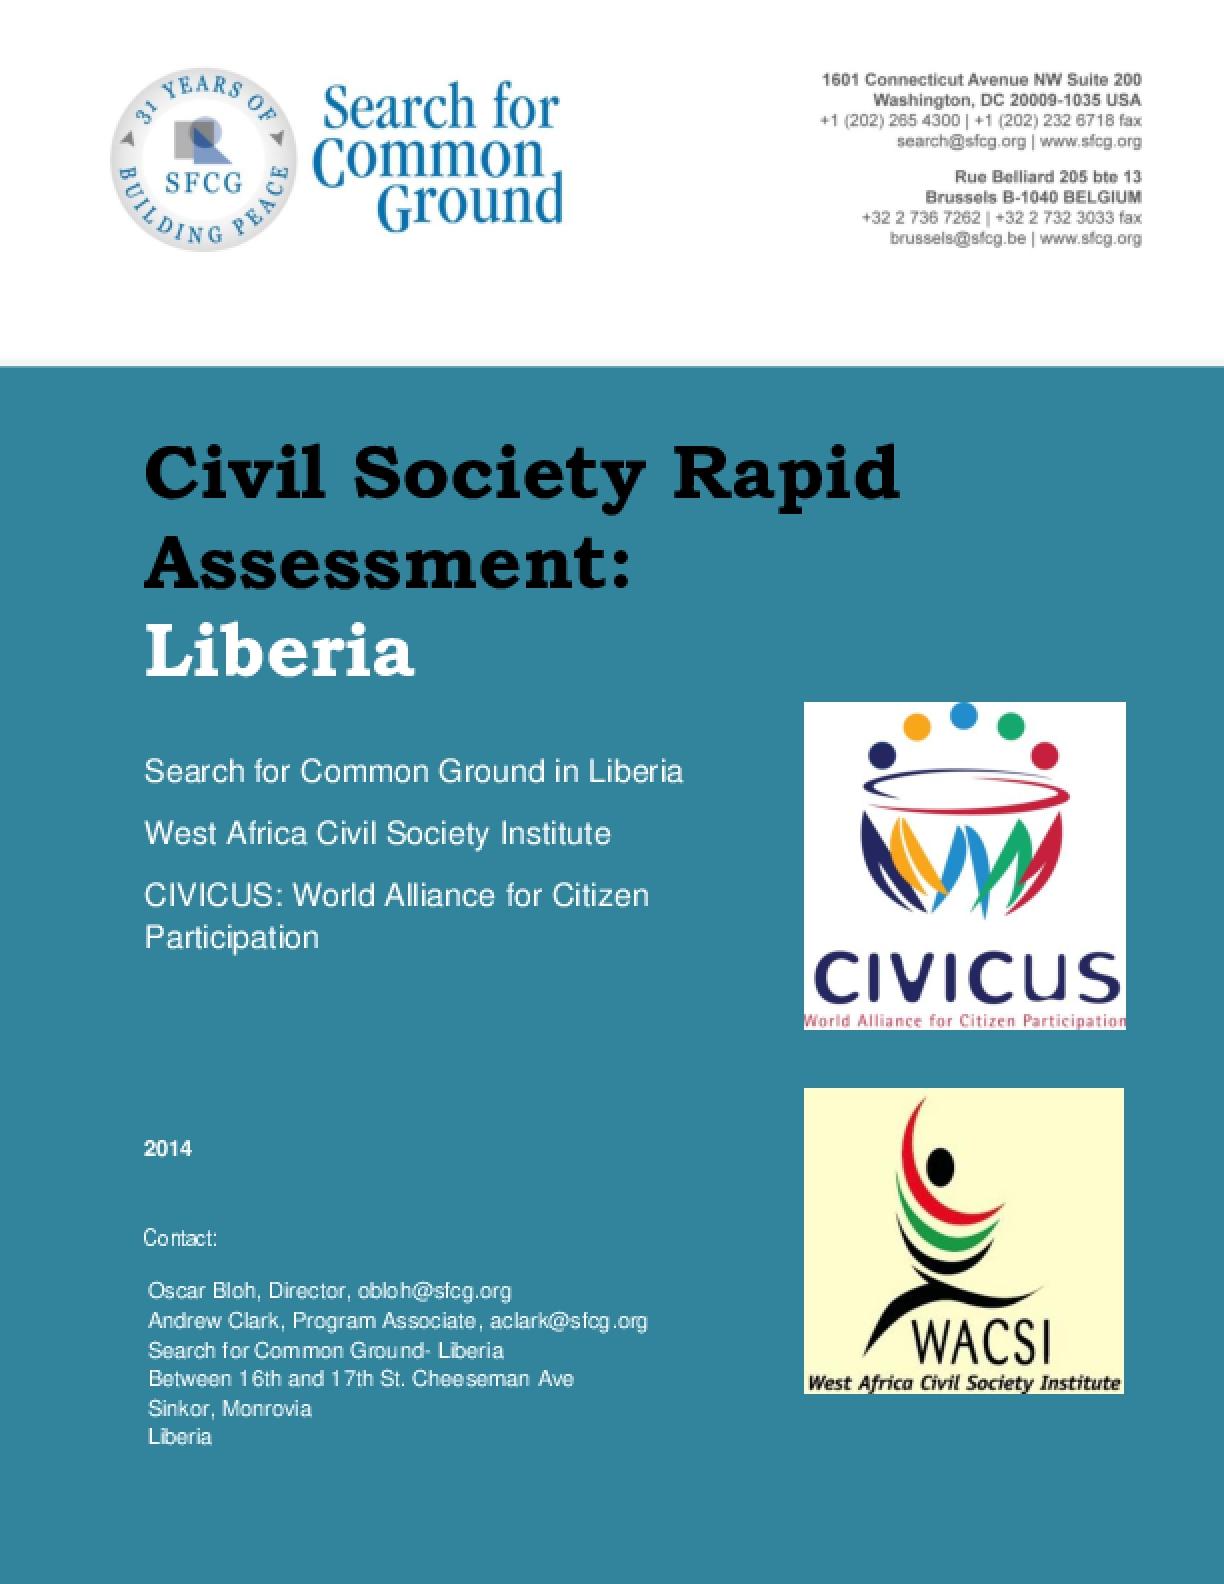 Civil Society Rapid Assessment: Liberia